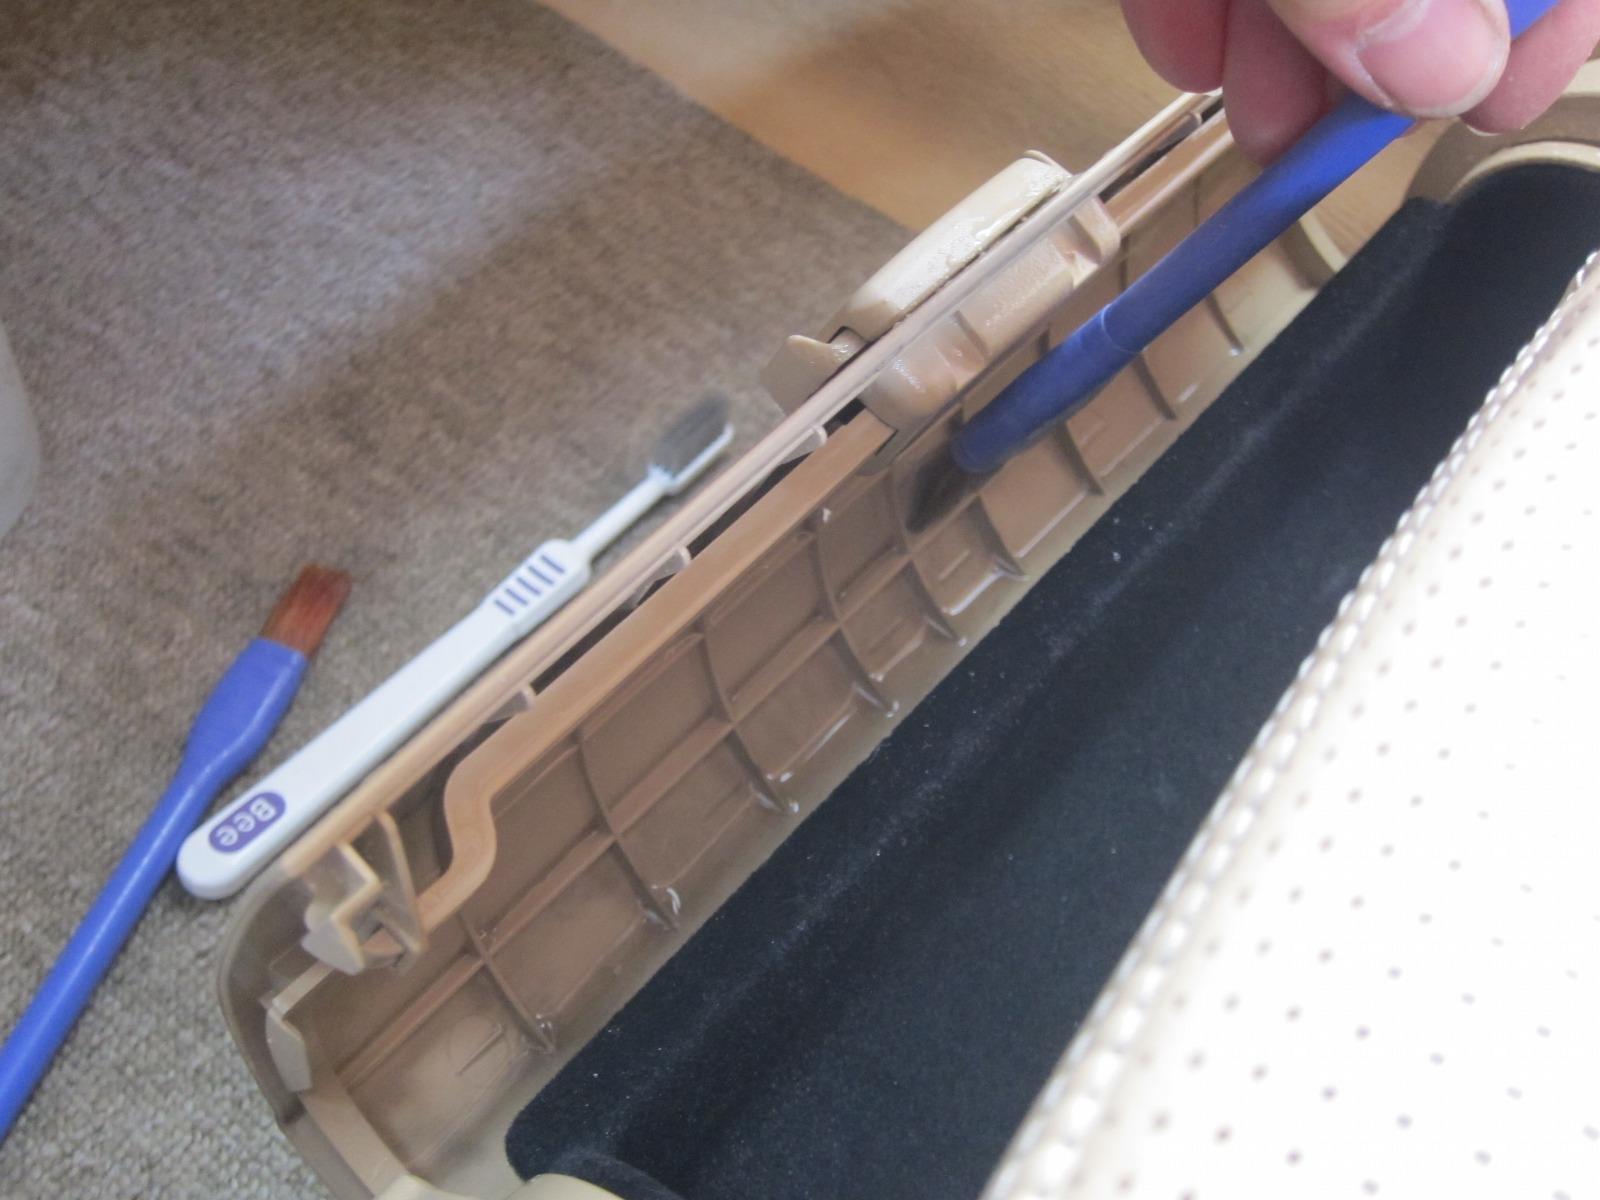 20131231-mercedes-benz-cl55-amg-15